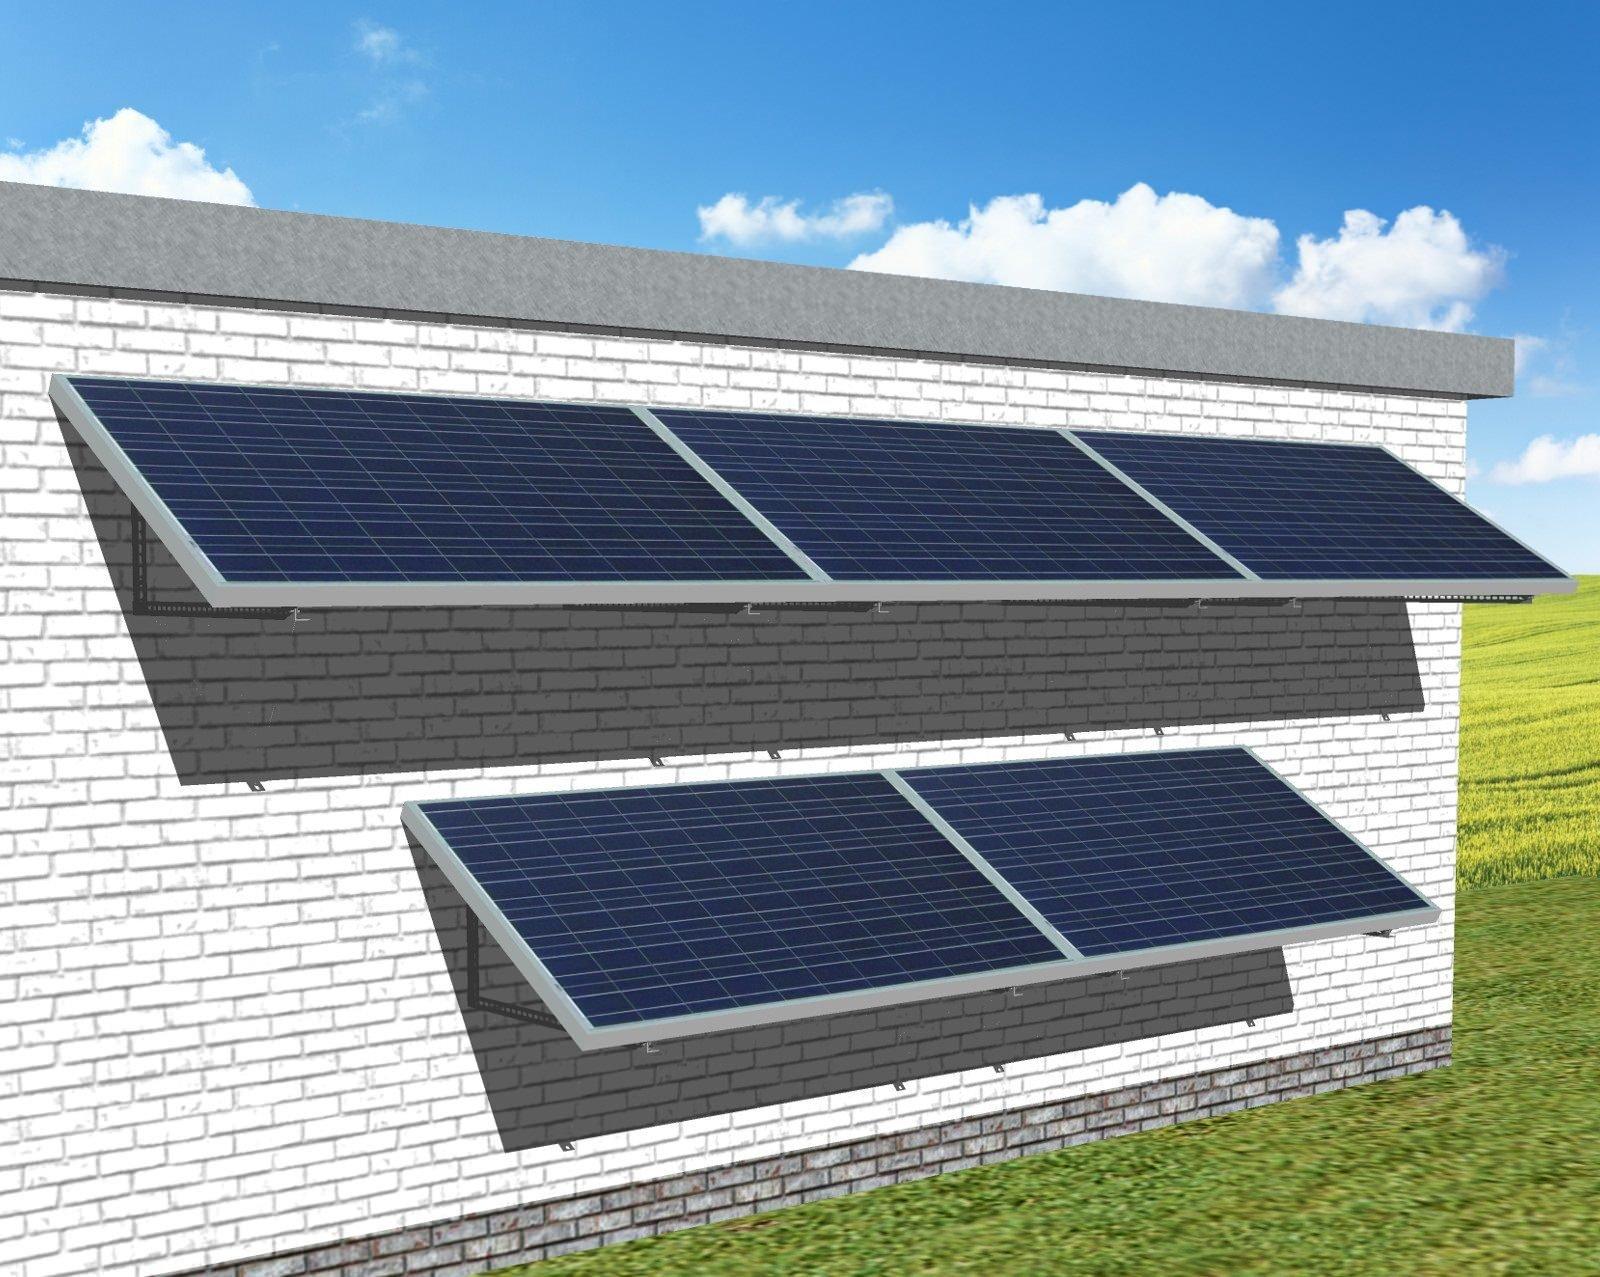 myCleantech-Solar.org Solaranalage Fassade oder Carport mit 5 Pannels